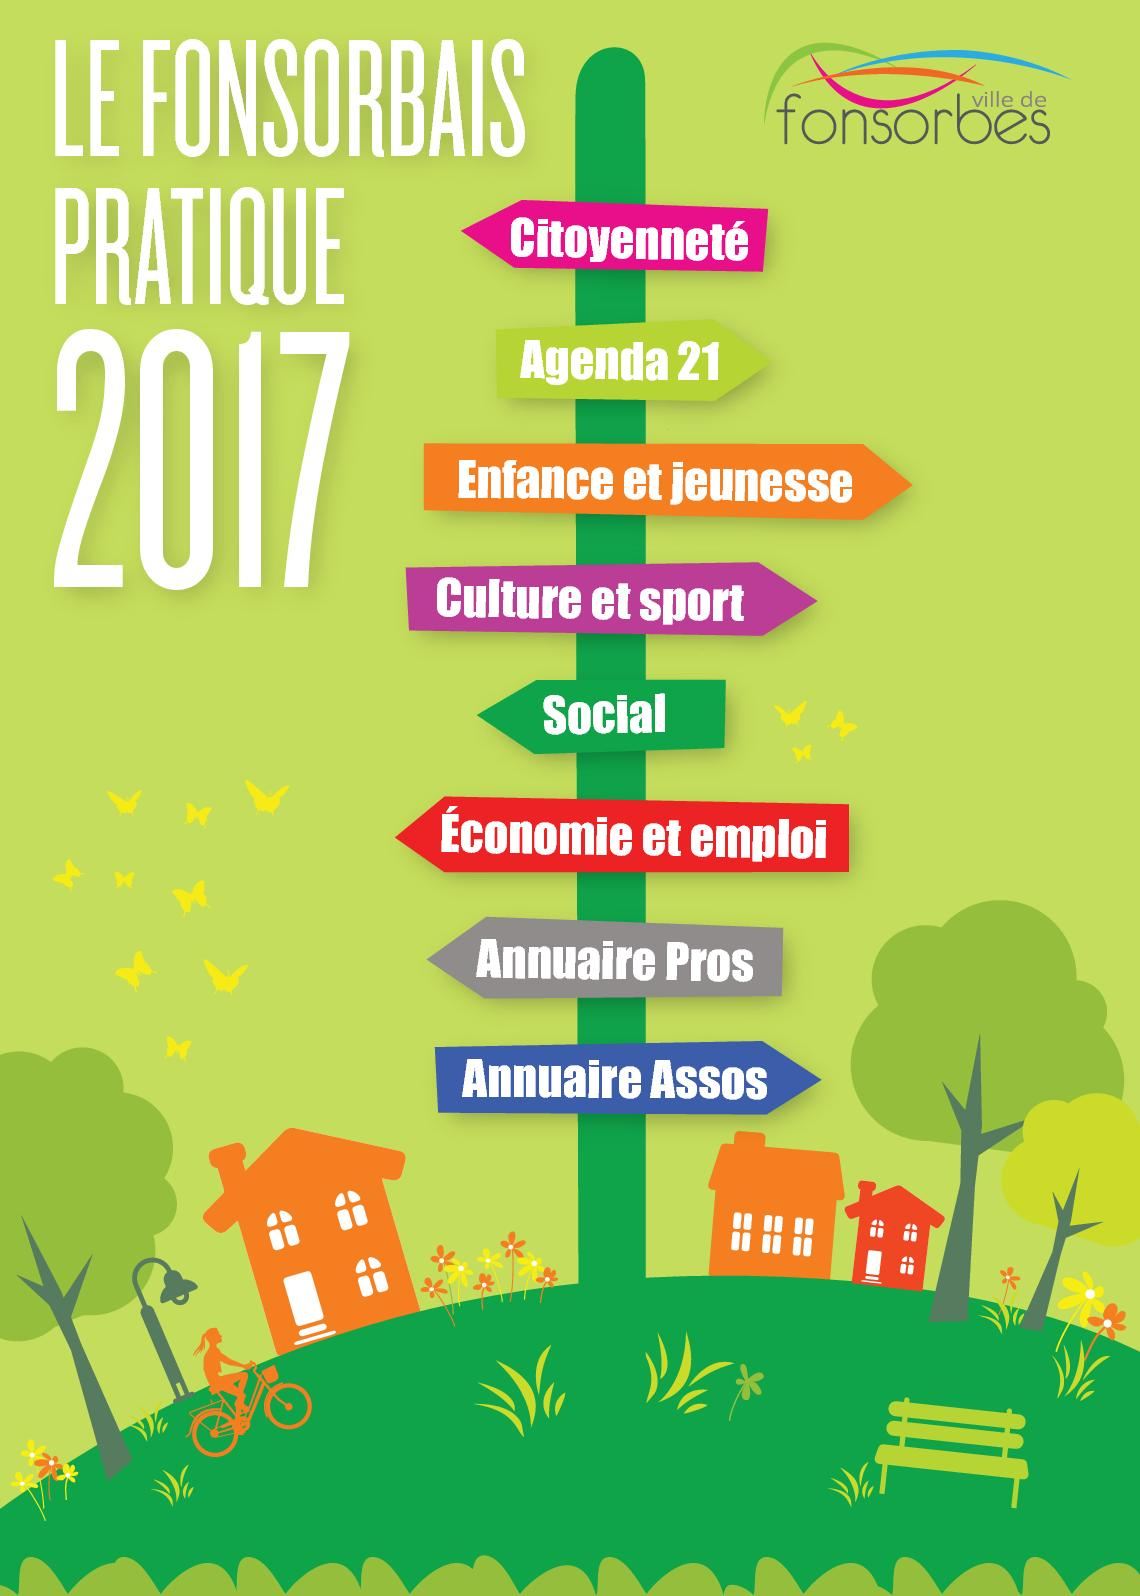 2B Auto Fonsorbes calaméo - fonsorbais pratique 2017